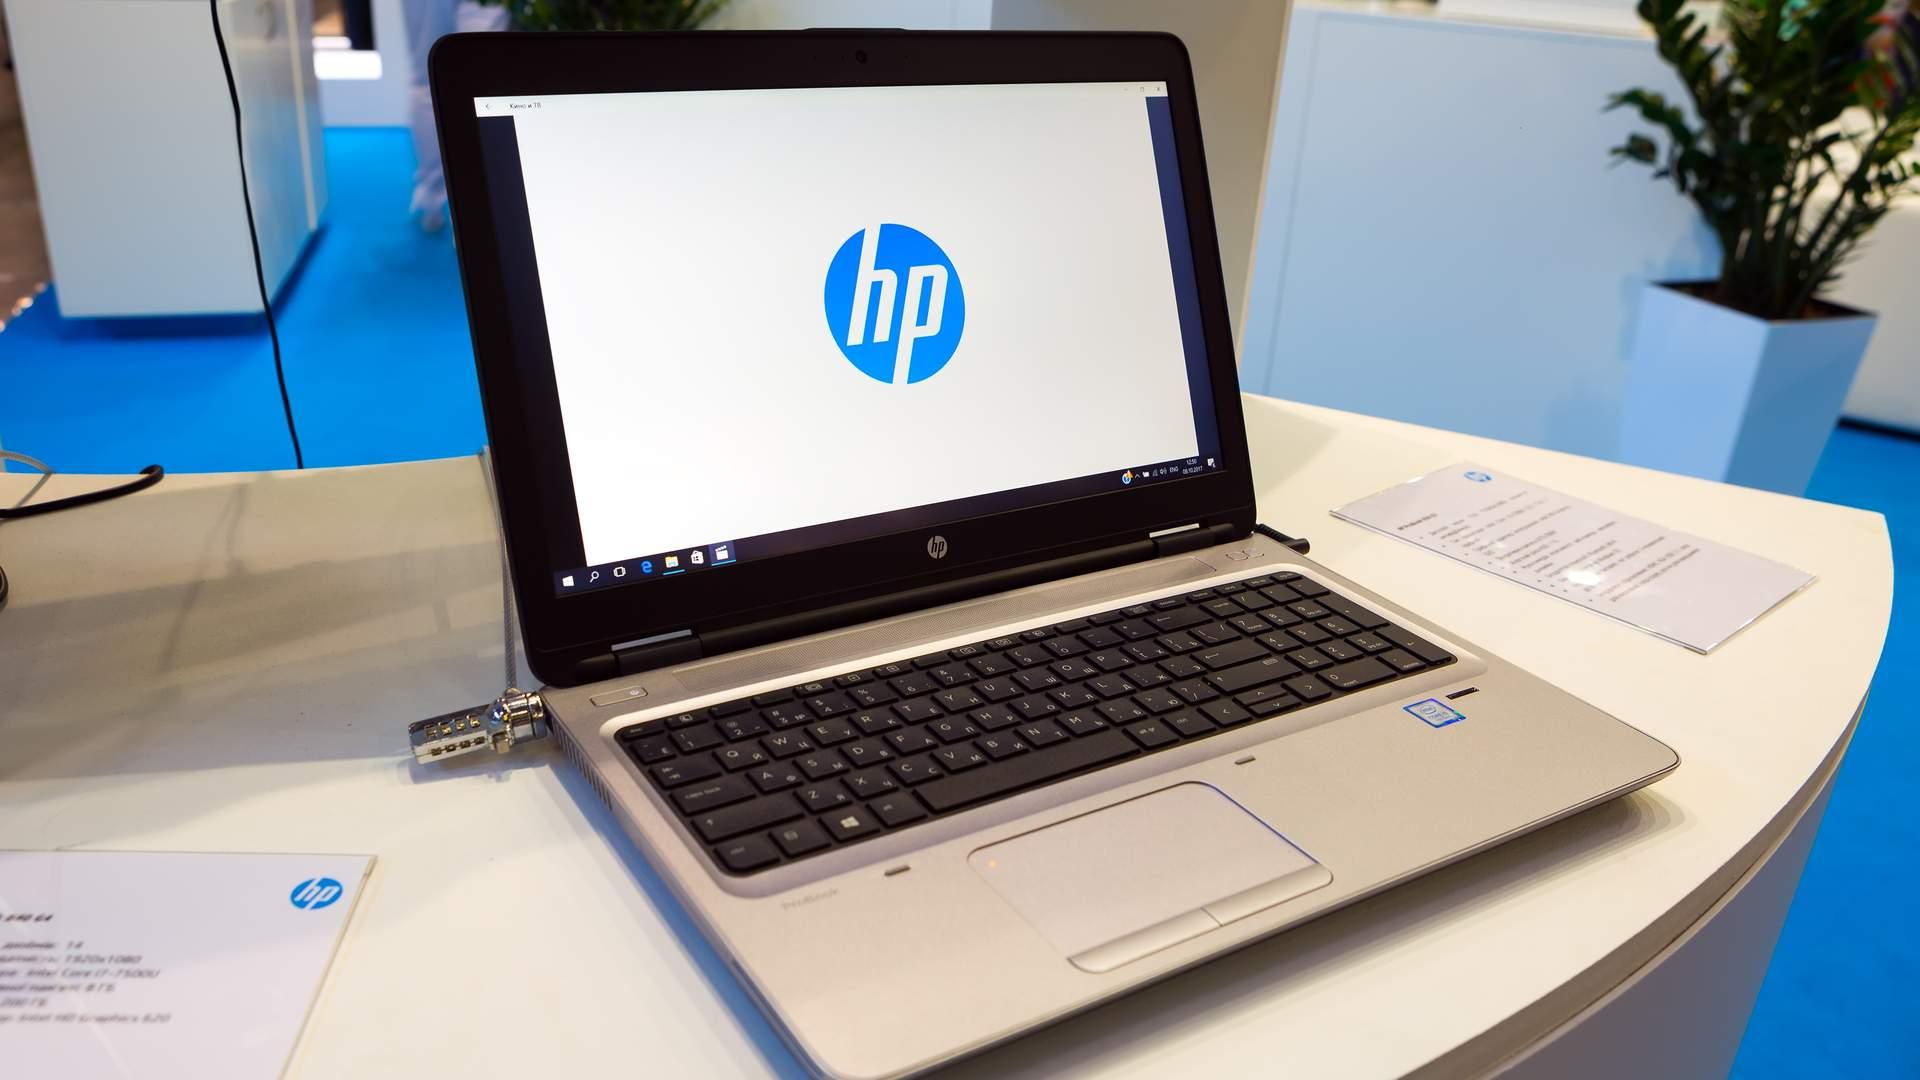 A linha Compaq Presario passou a se chamar HP Presario (Fonte: Shutterstock/Godlikeheart)